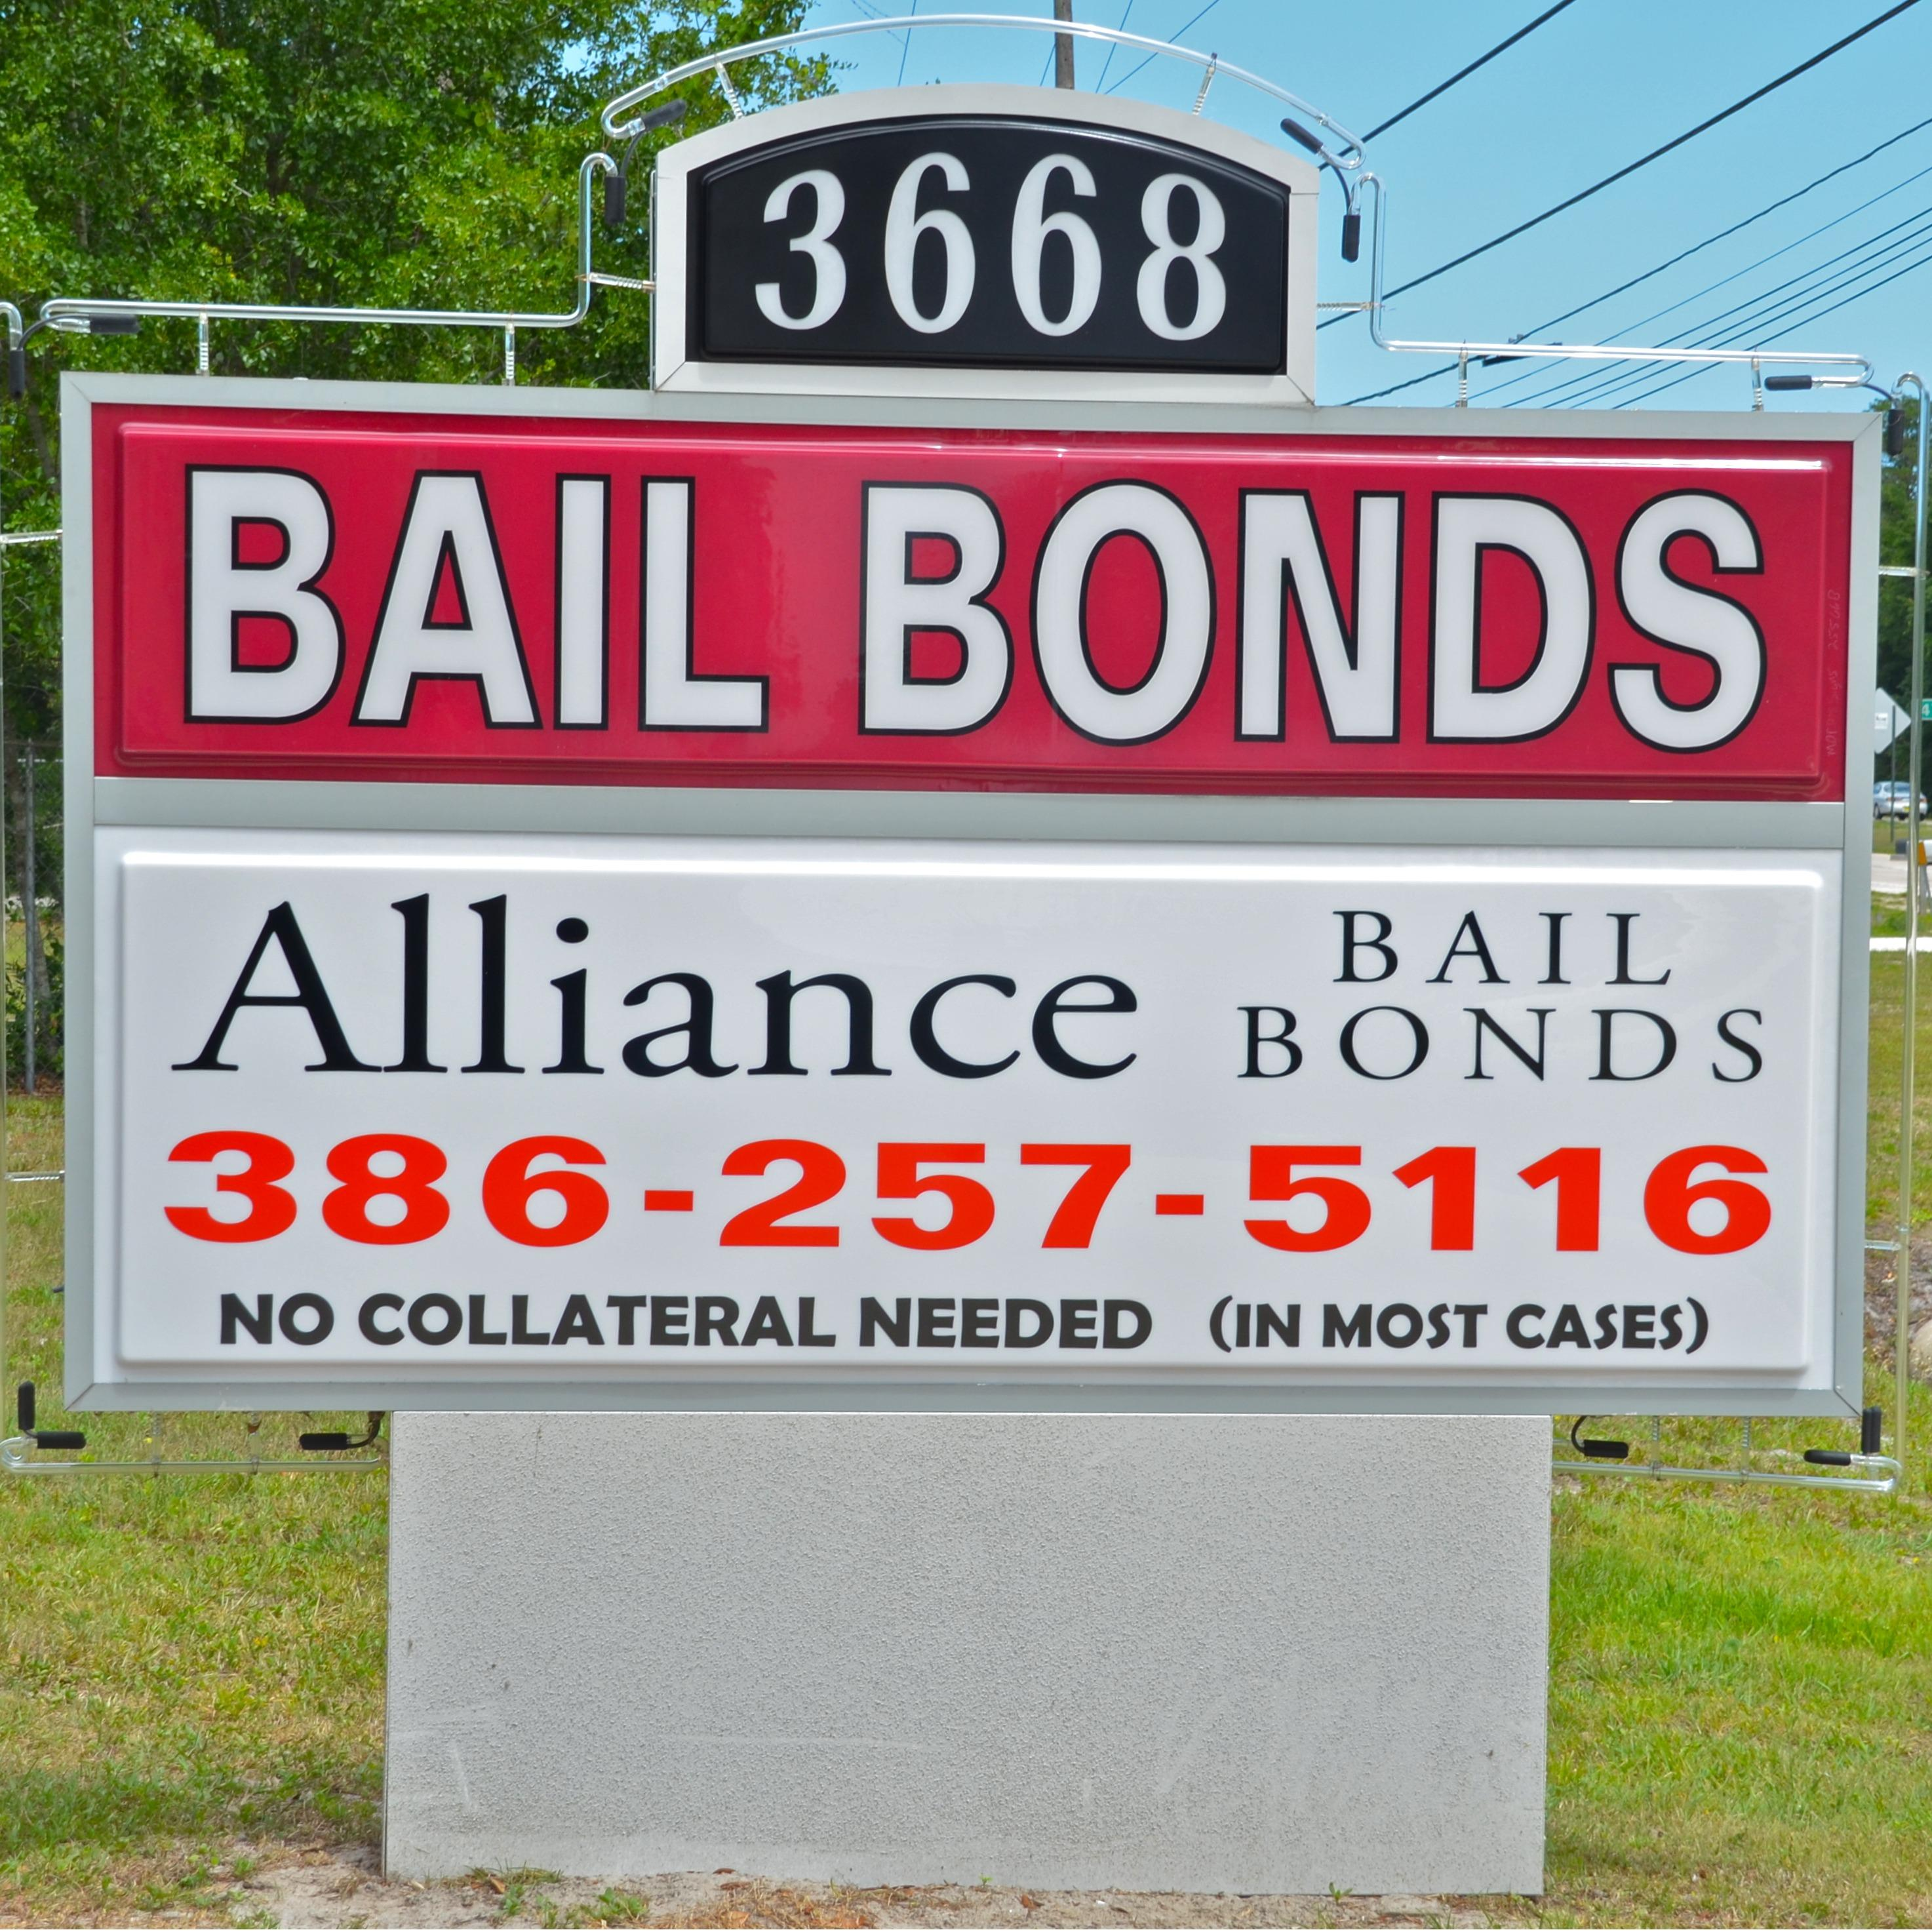 Alliance Bail Bonds